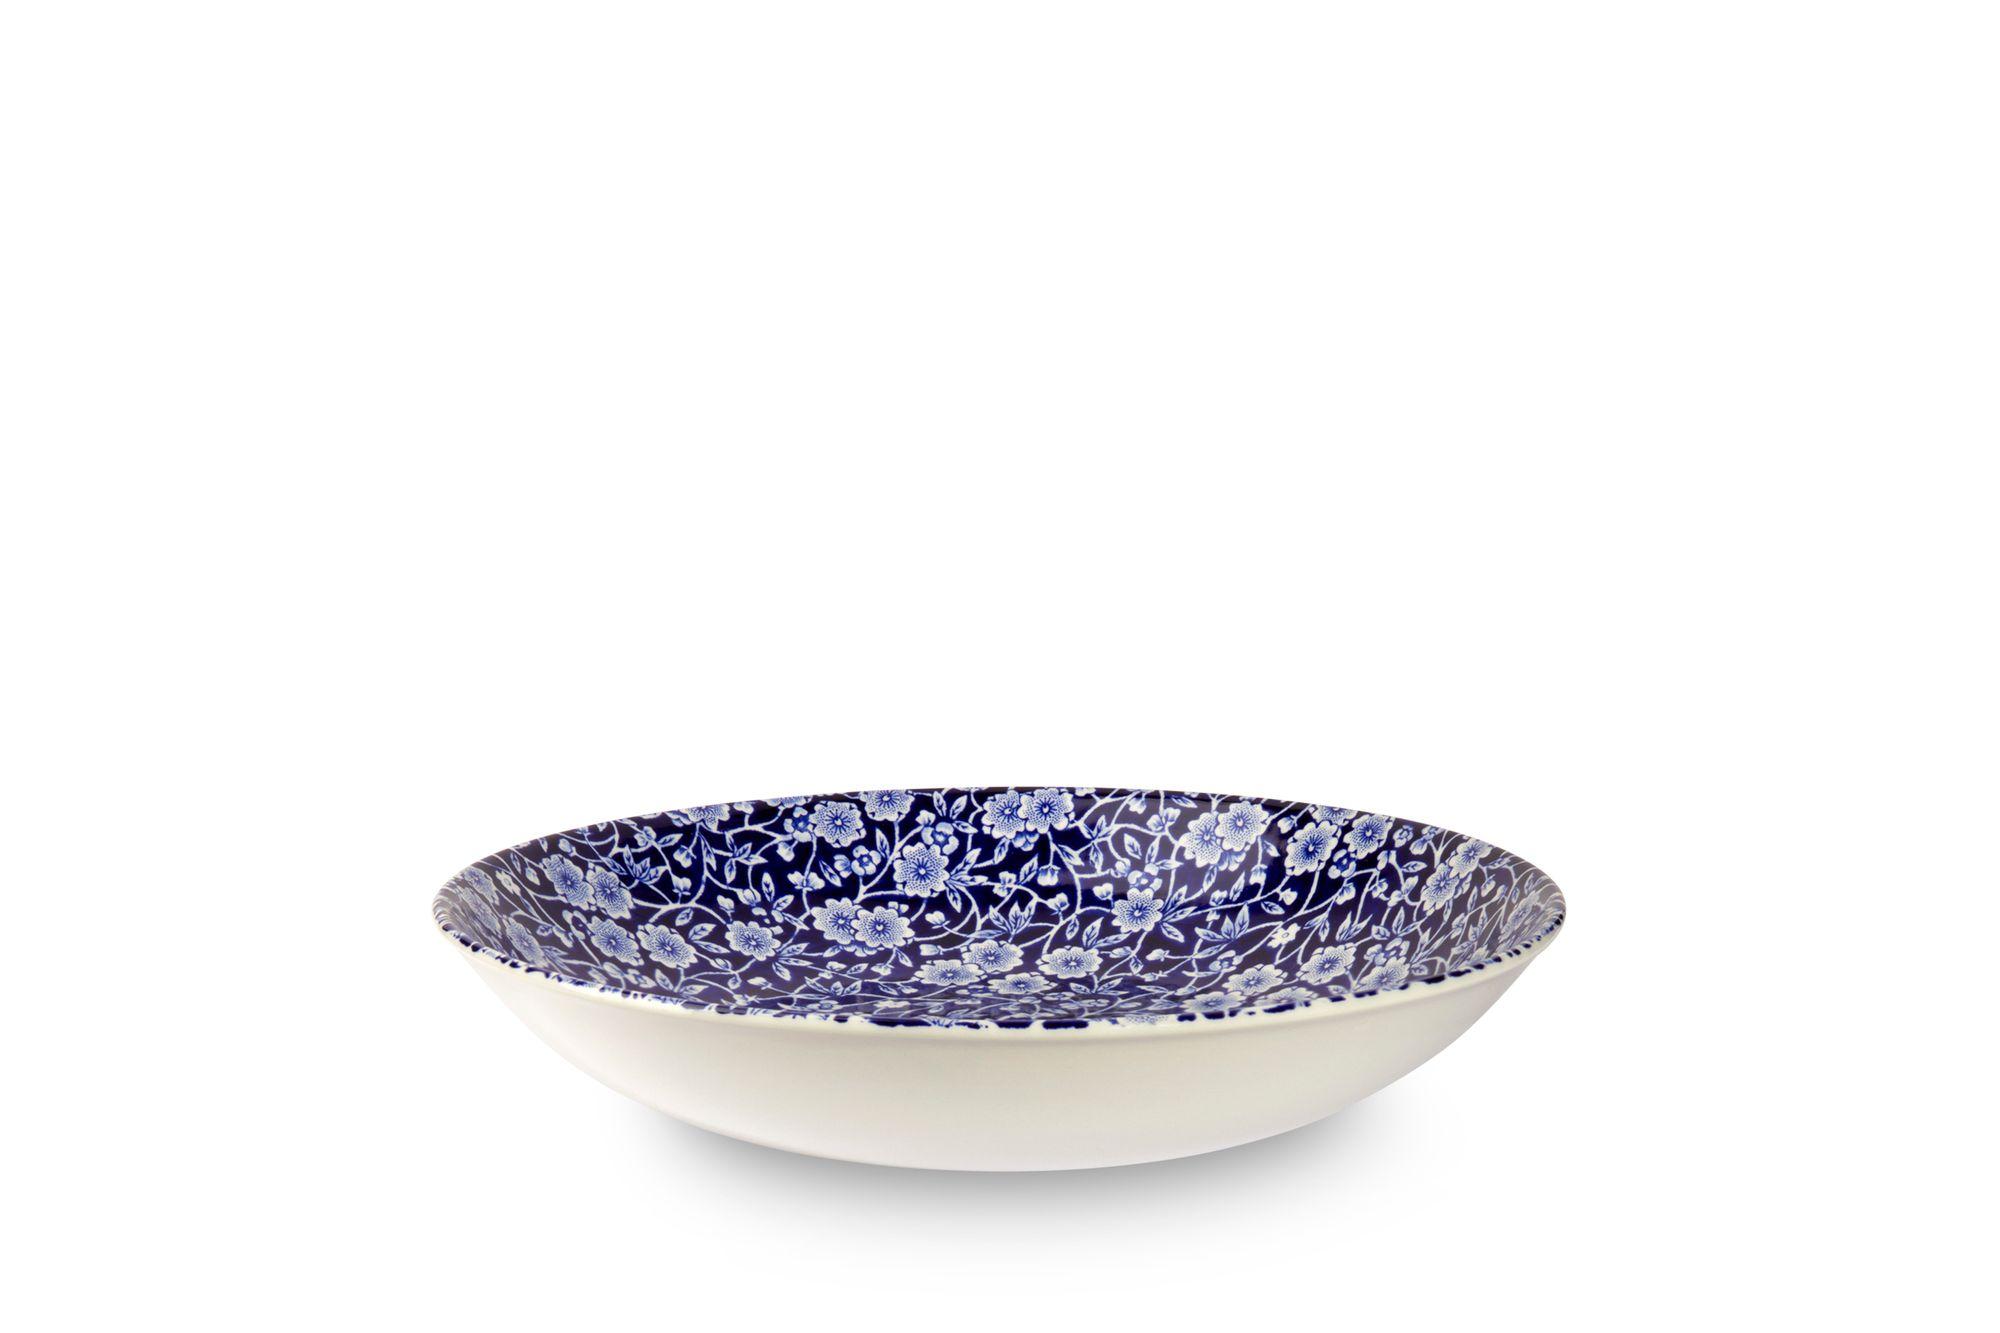 Burleigh Blue Calico Pasta Bowl thumb 1